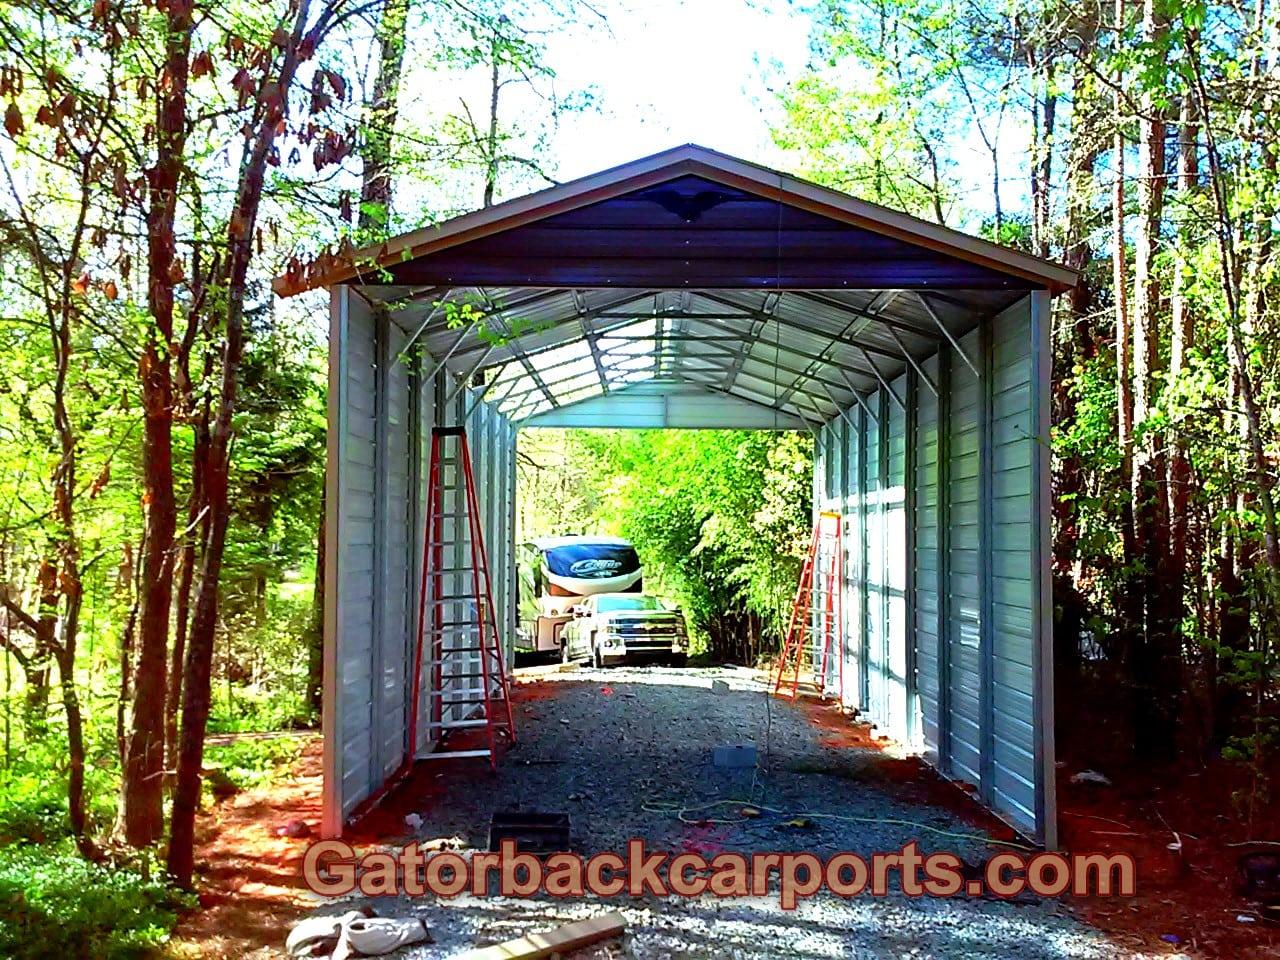 rv carports rv covers rv garages gatorback carports. Black Bedroom Furniture Sets. Home Design Ideas